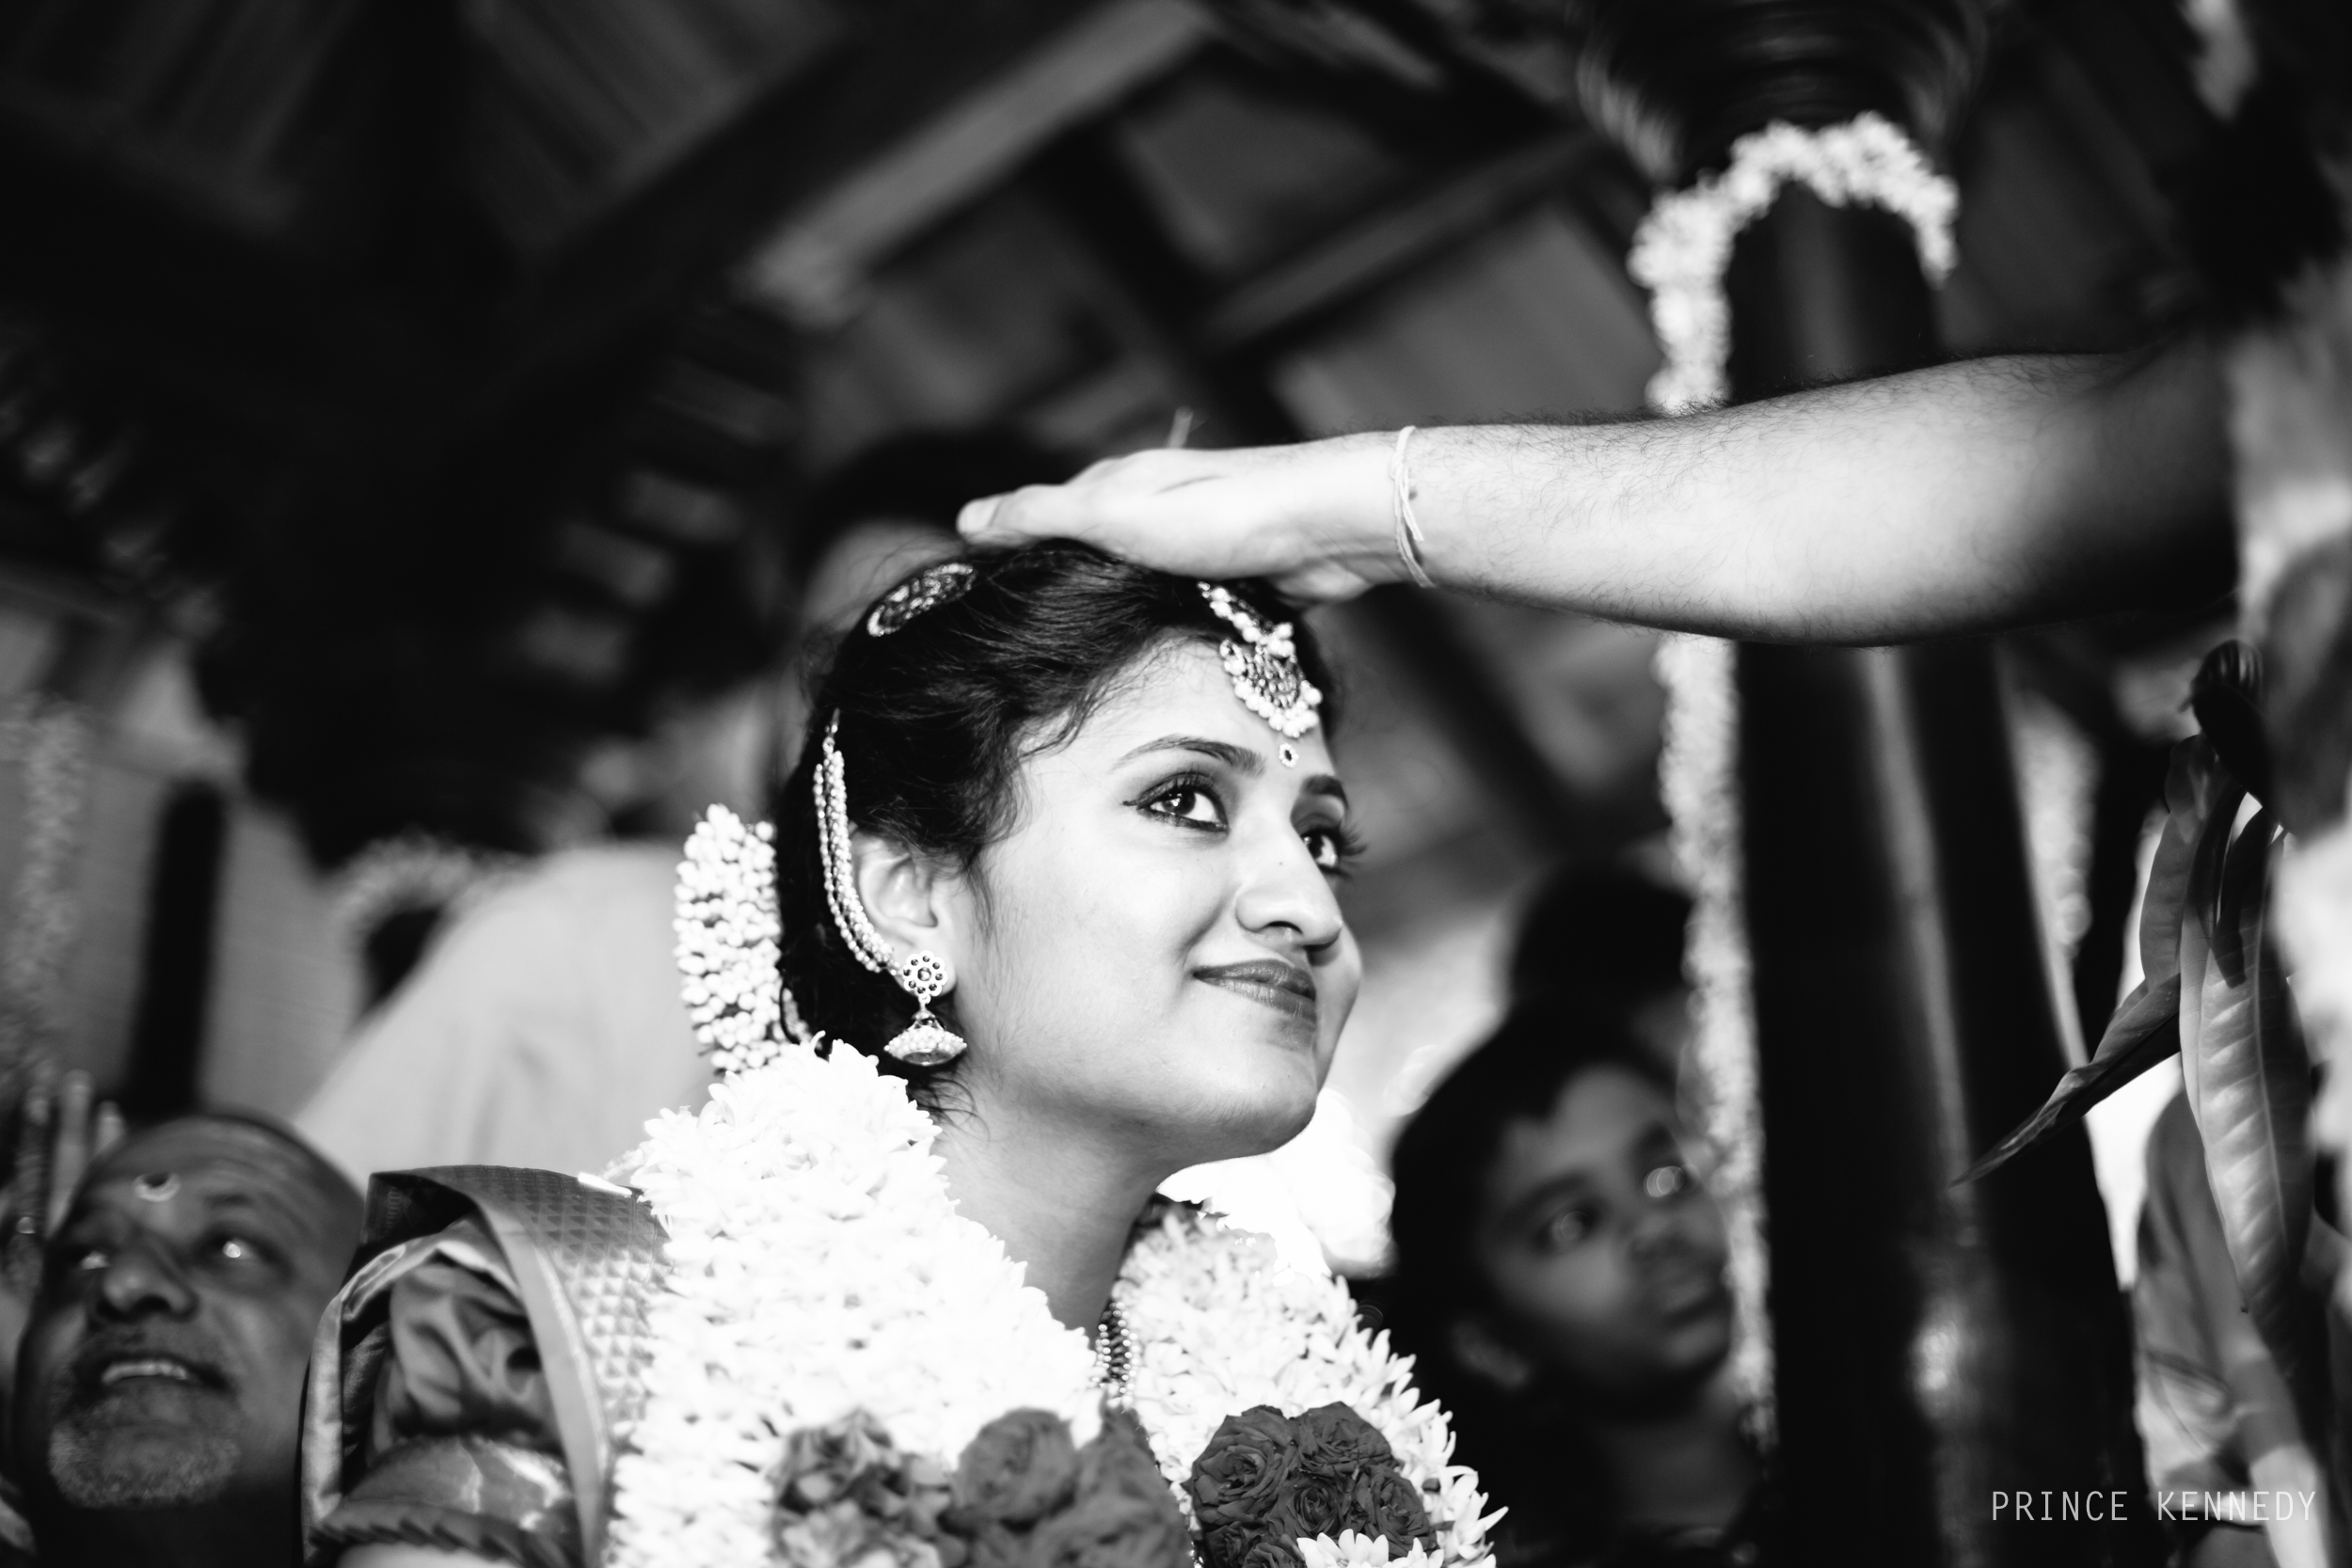 Athmajja-Nithesh-Engagement-Couple-Portrait-Portraiture-Wedding-Couple-Portrait-Chennai-Photographer-Candid-Photography-Destination-Best-Prince-Kennedy-Photography-279.jpg